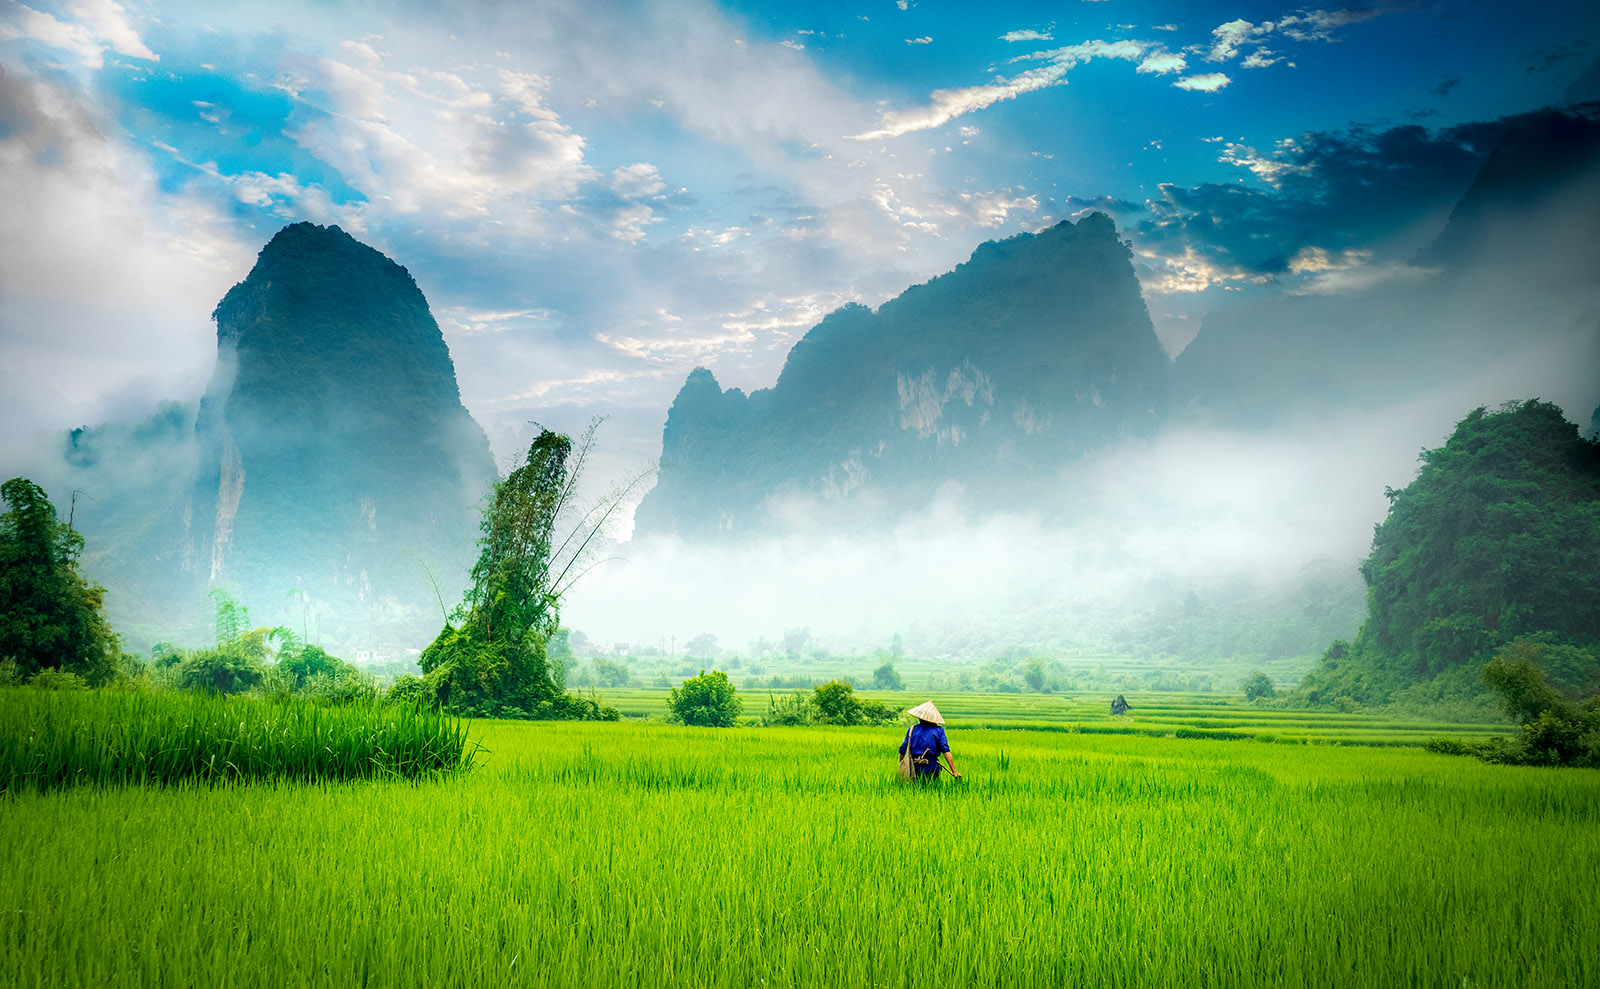 man standing in a green field in vietname